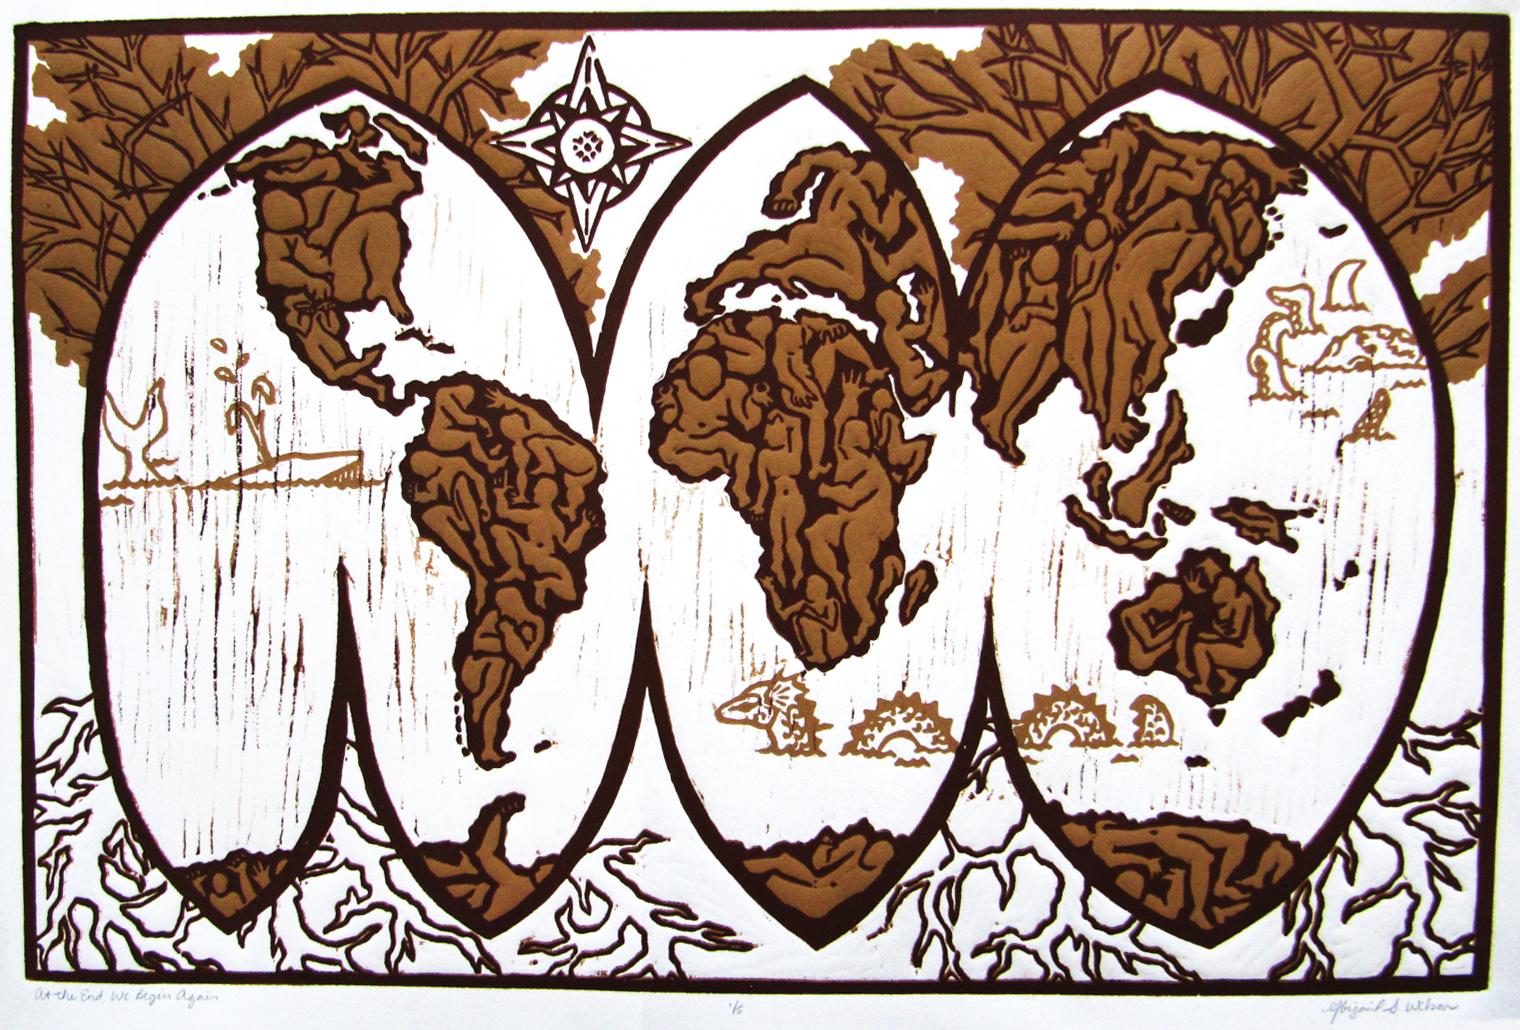 Abigail Wilson, At The End We Begin Again, Reduction Wood Block Print, $350 PROMO.jpg